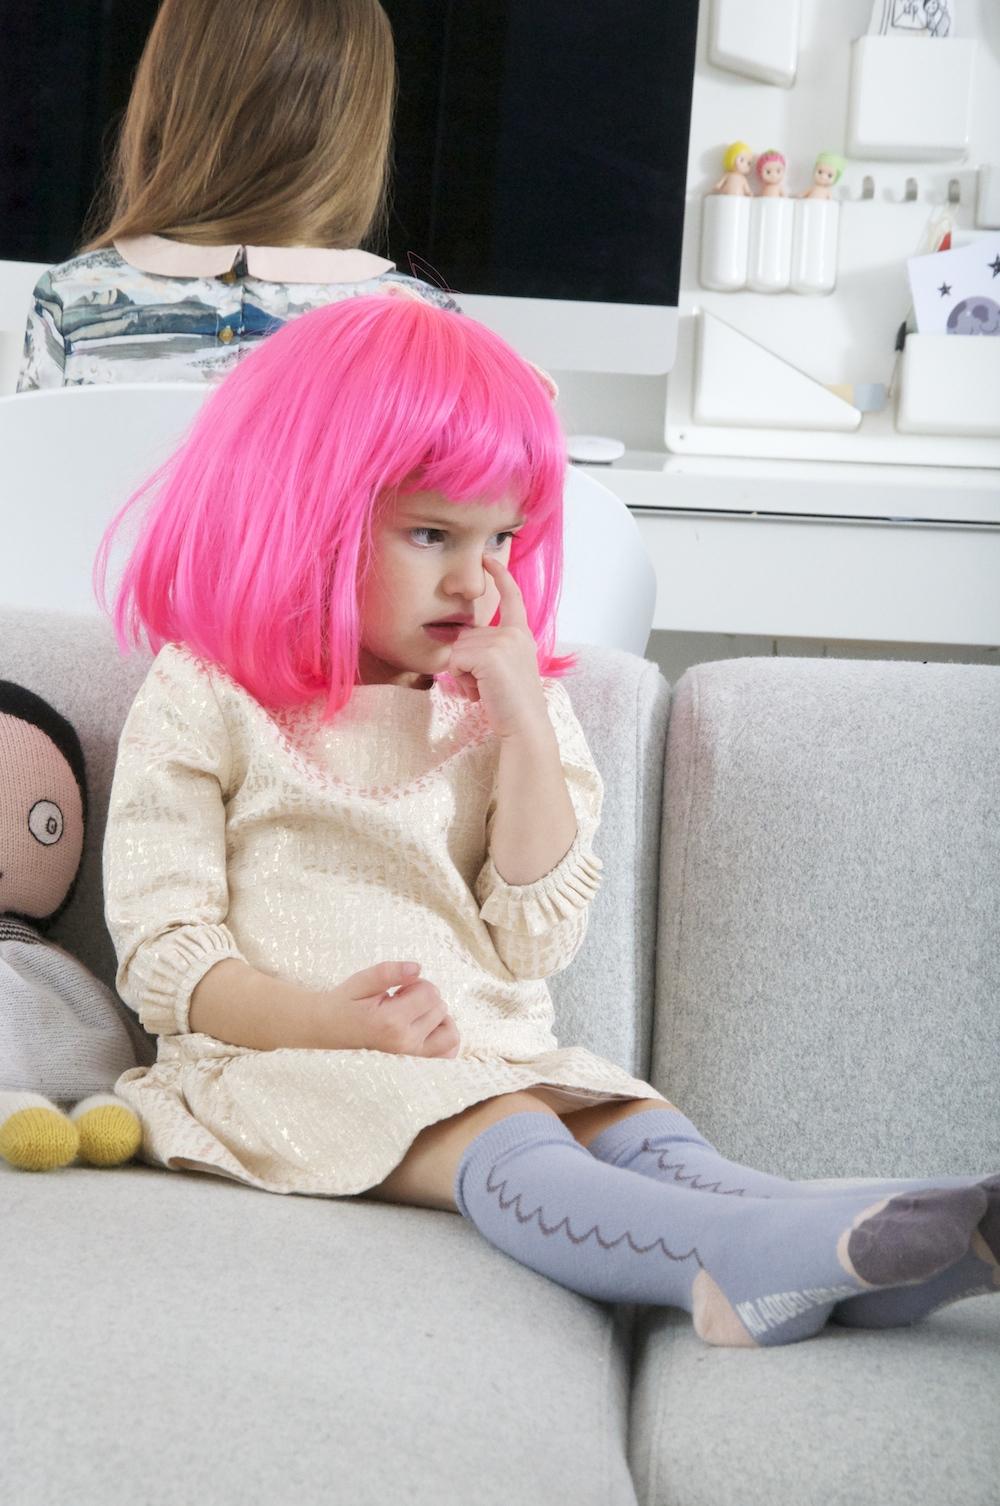 No_added_sugar_pink_hair